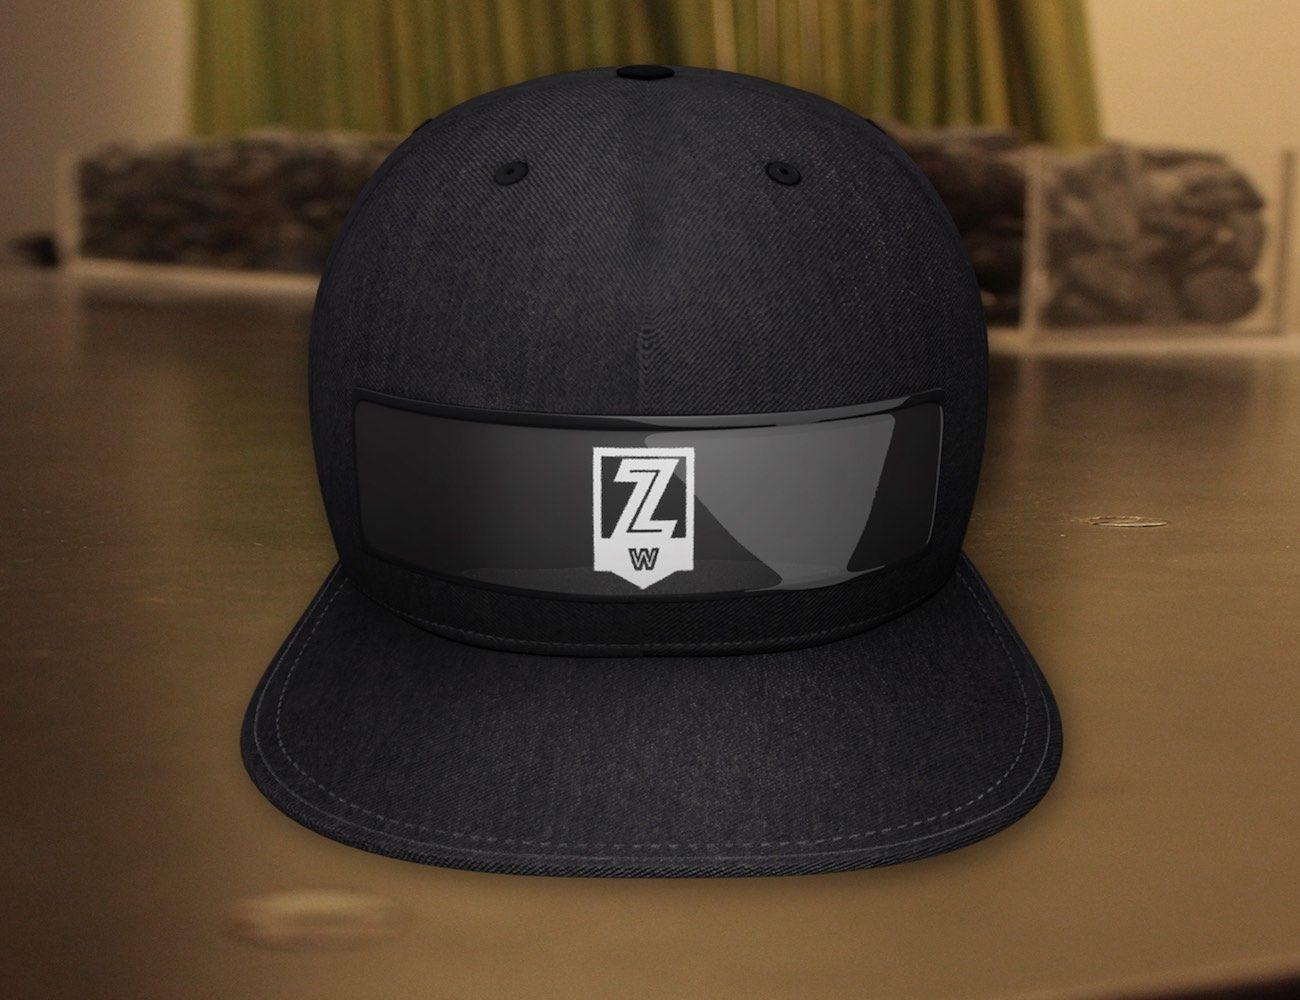 Revolutionary Hat For 21st Century Stylish Hats Hats Revolutionaries